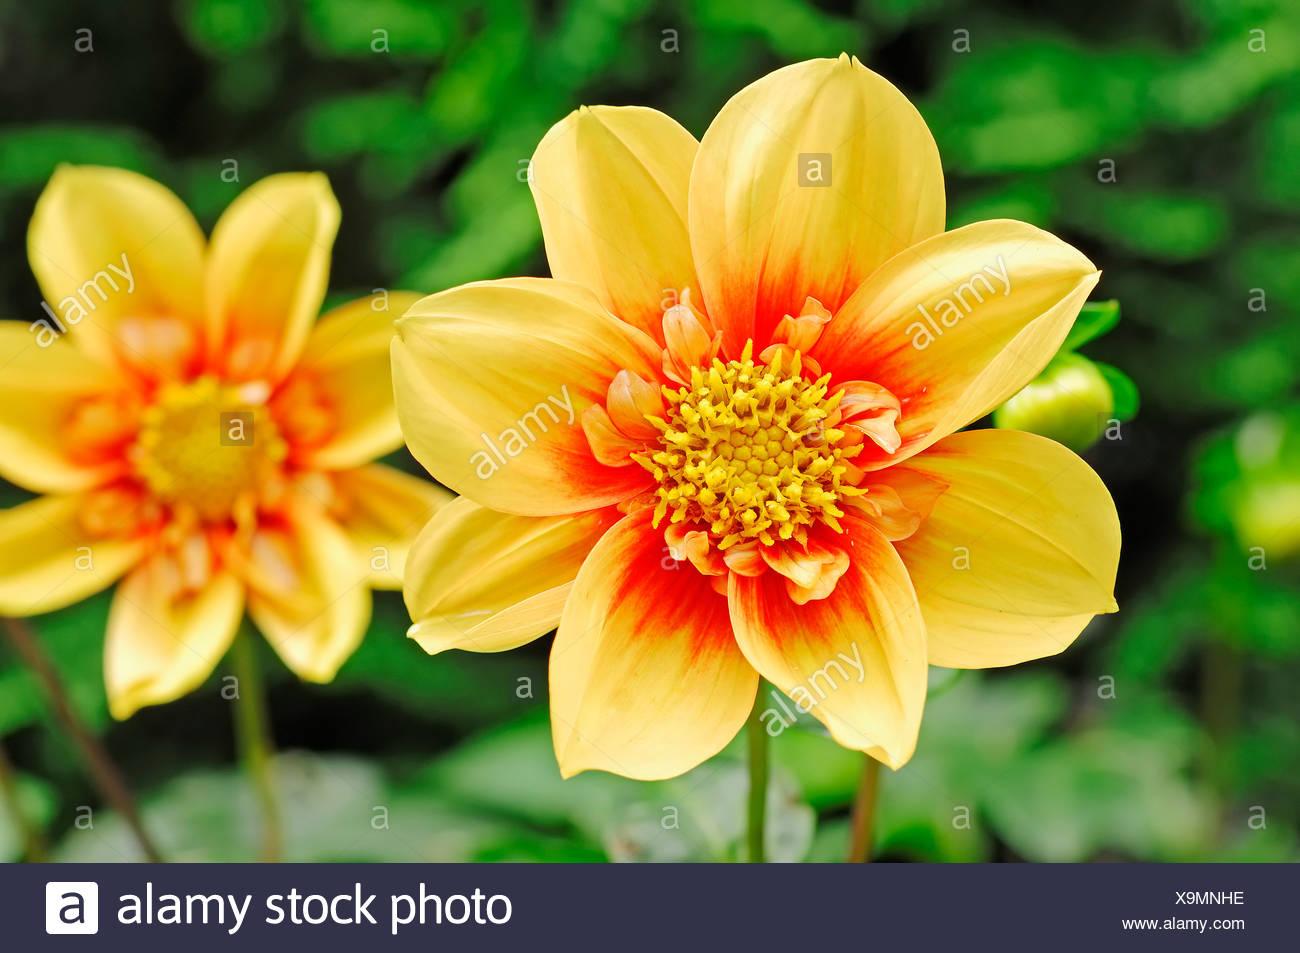 Varieties of dahlia blooms stock photos varieties of dahlia blooms dahlia dahlia sp flowers stock image izmirmasajfo